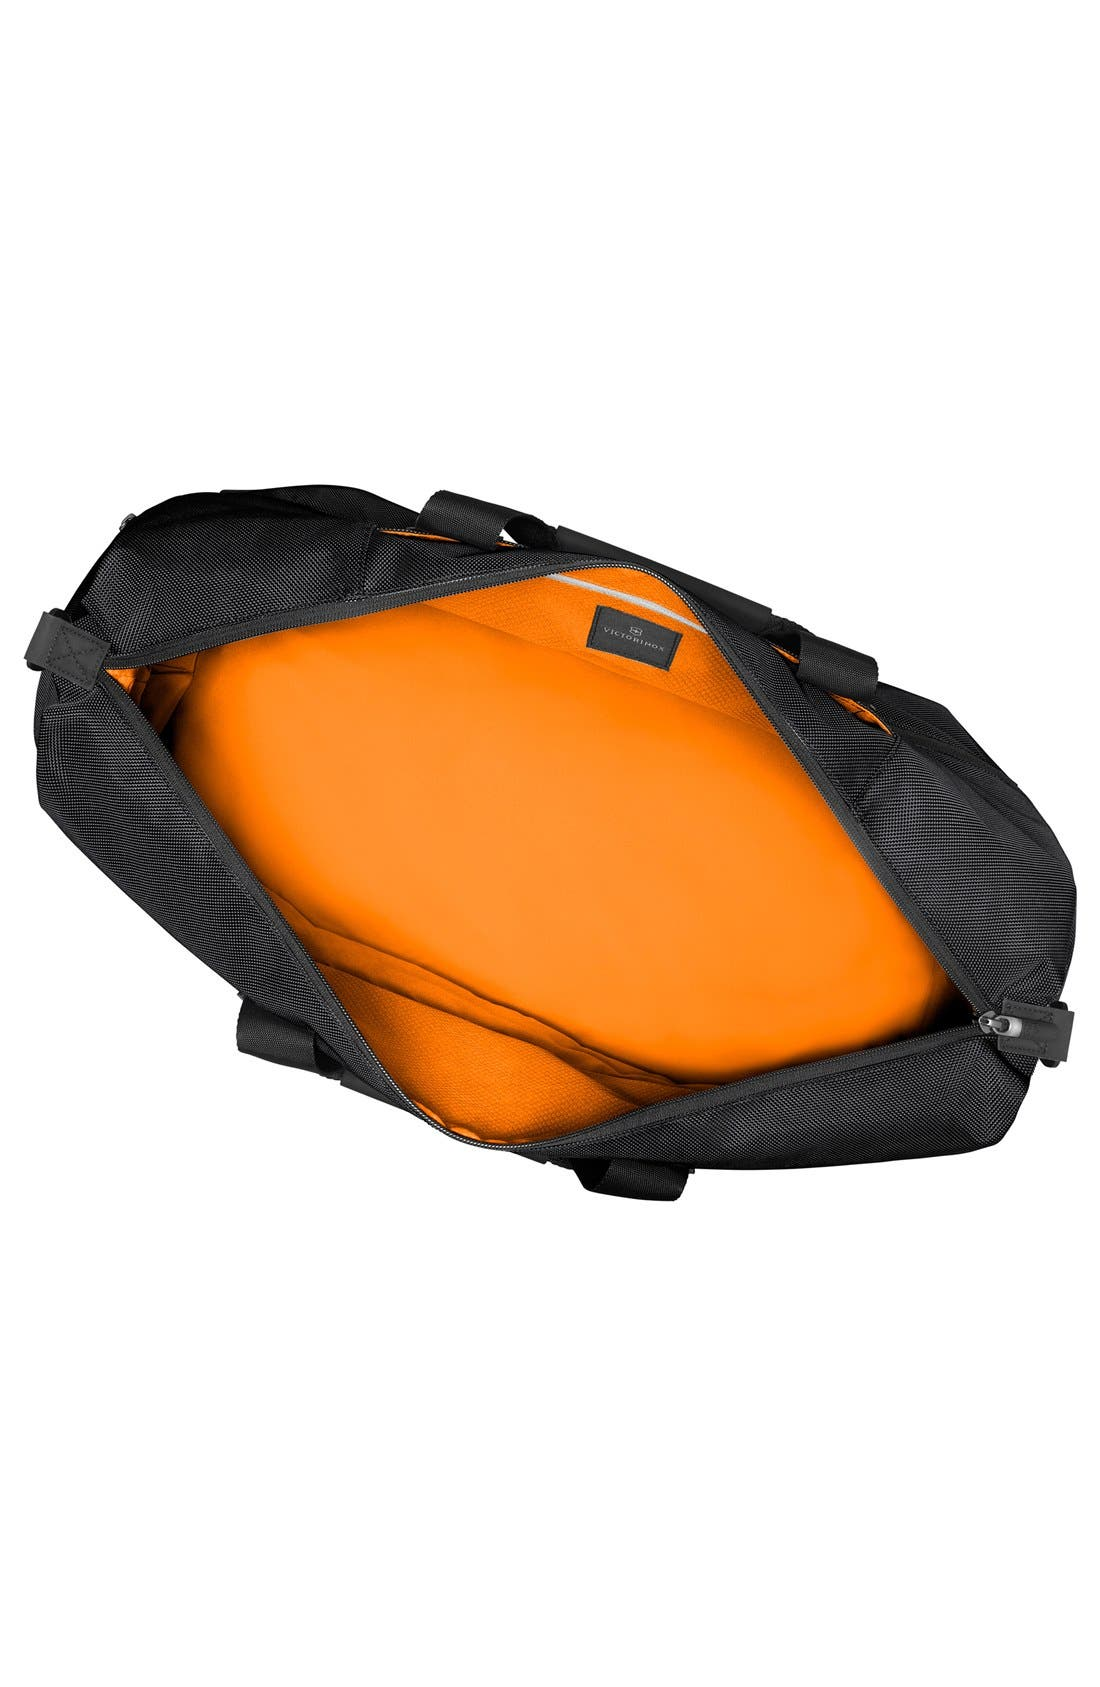 XL Duffel Bag,                             Alternate thumbnail 2, color,                             BLACK